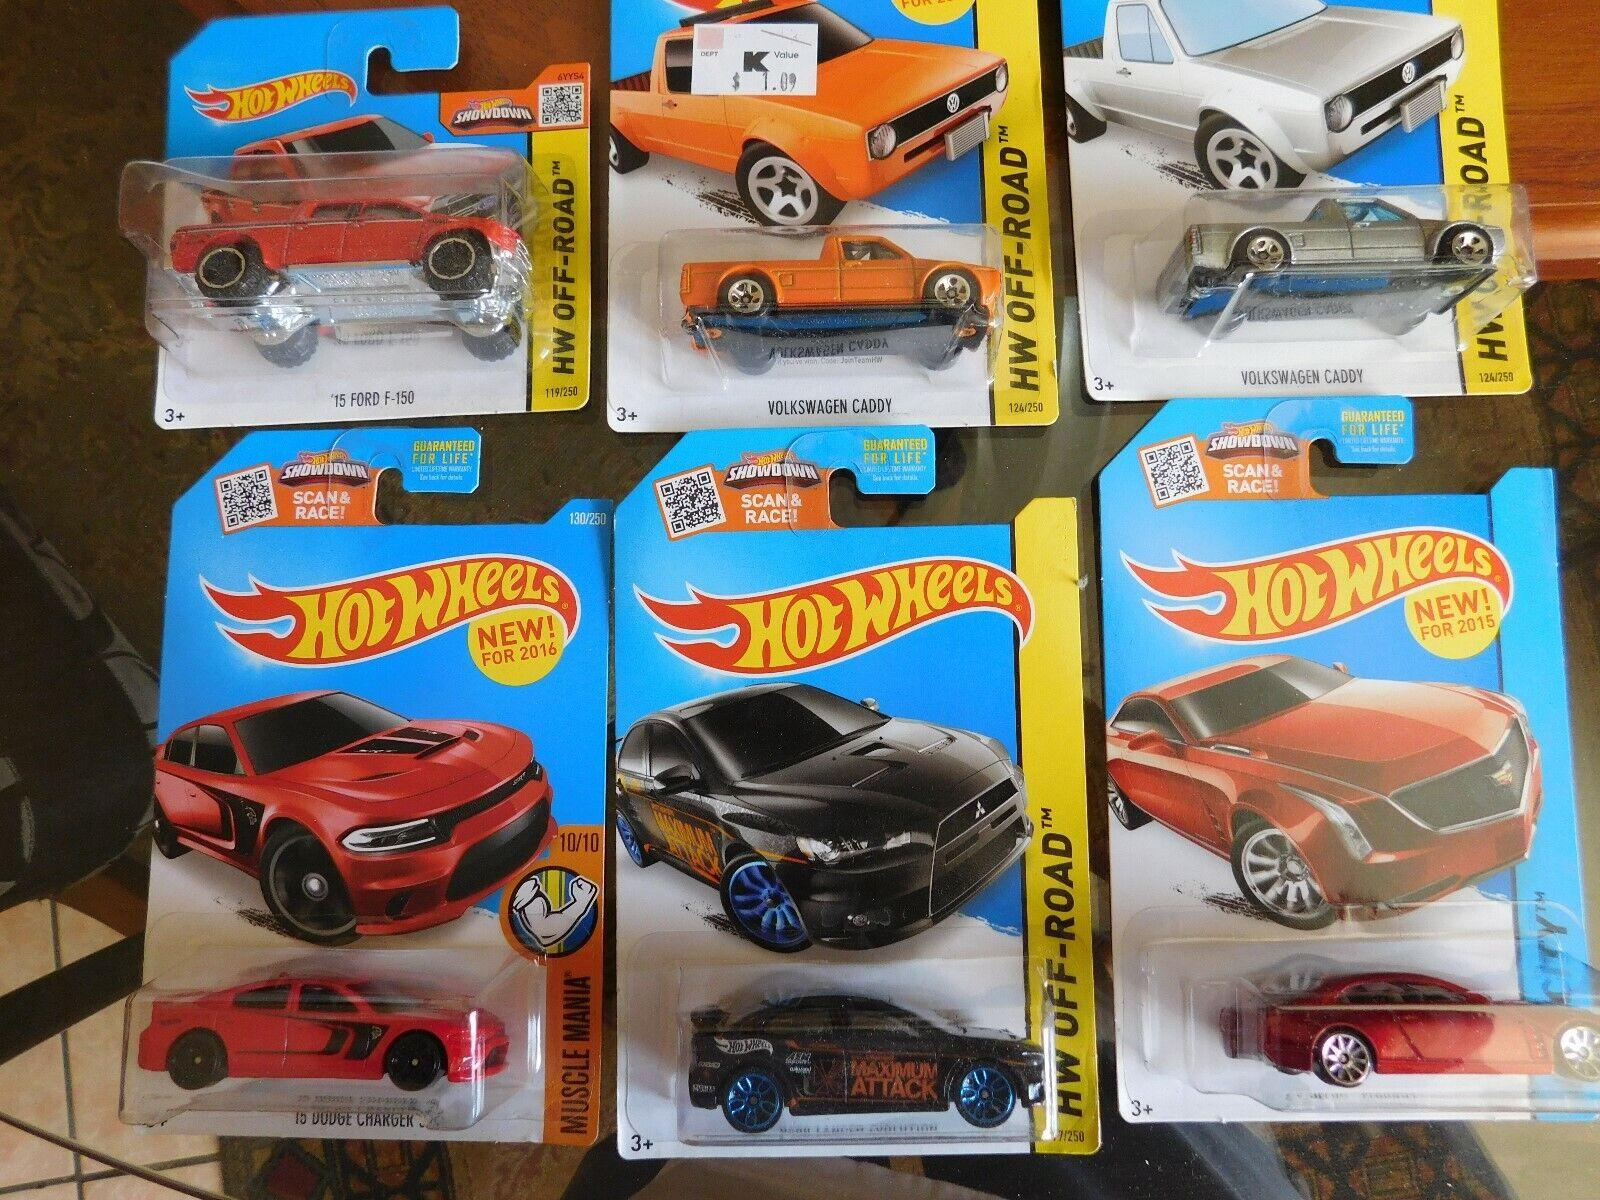 Hot wheels lot 25 cars dodge charger, Volkswagen etc